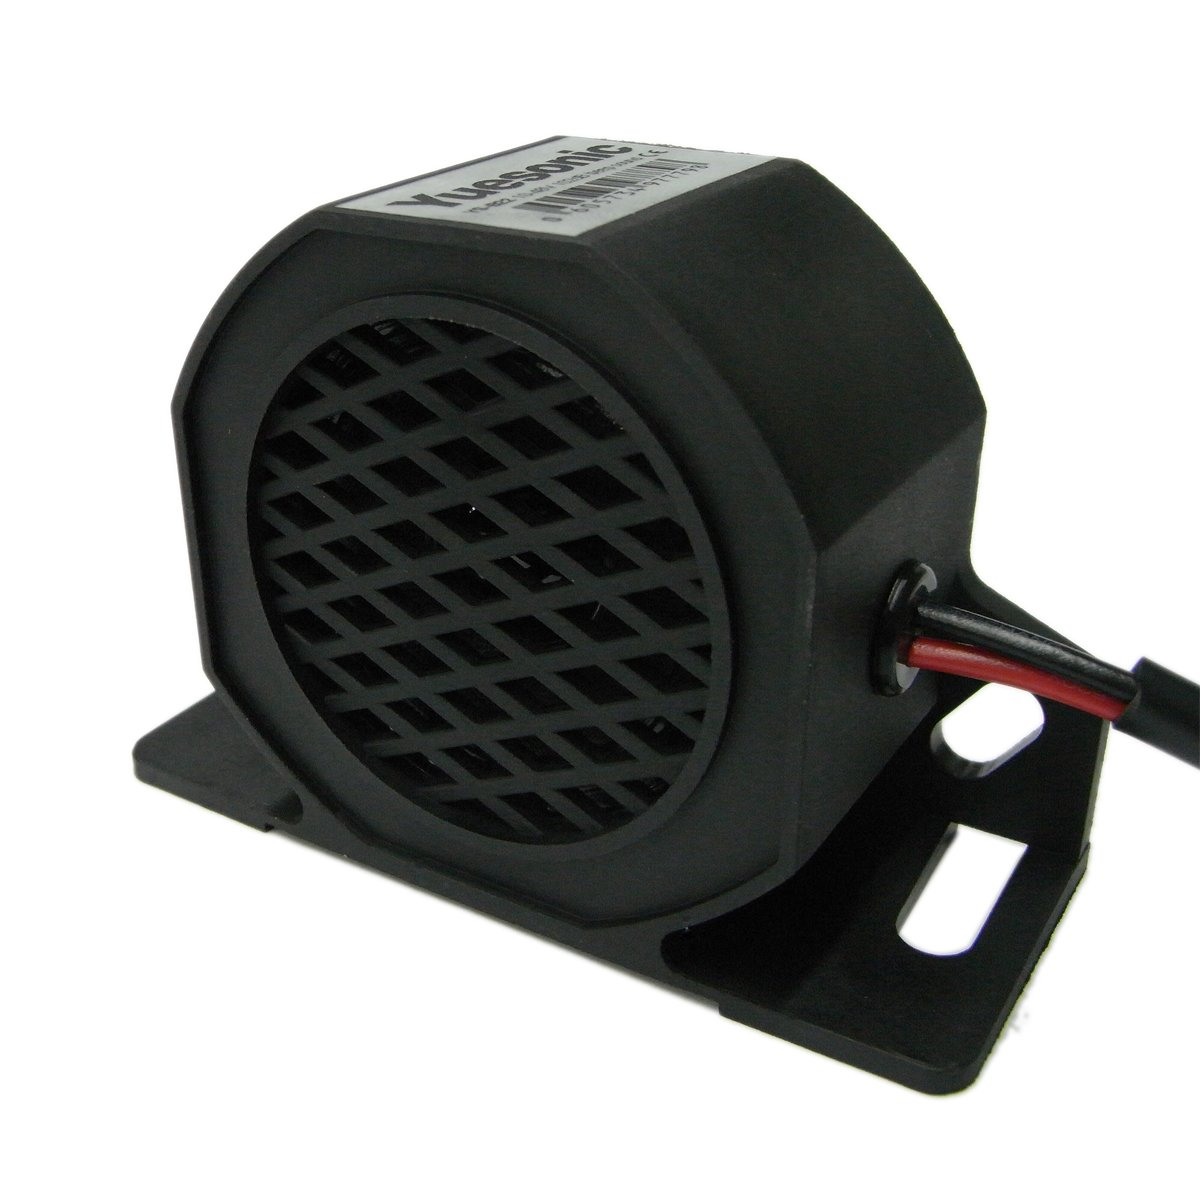 Yuesonic 102dB White Noise Backup Alarm Rü ckfahrwarner mit fü r 12/24 V Fahrzeuge